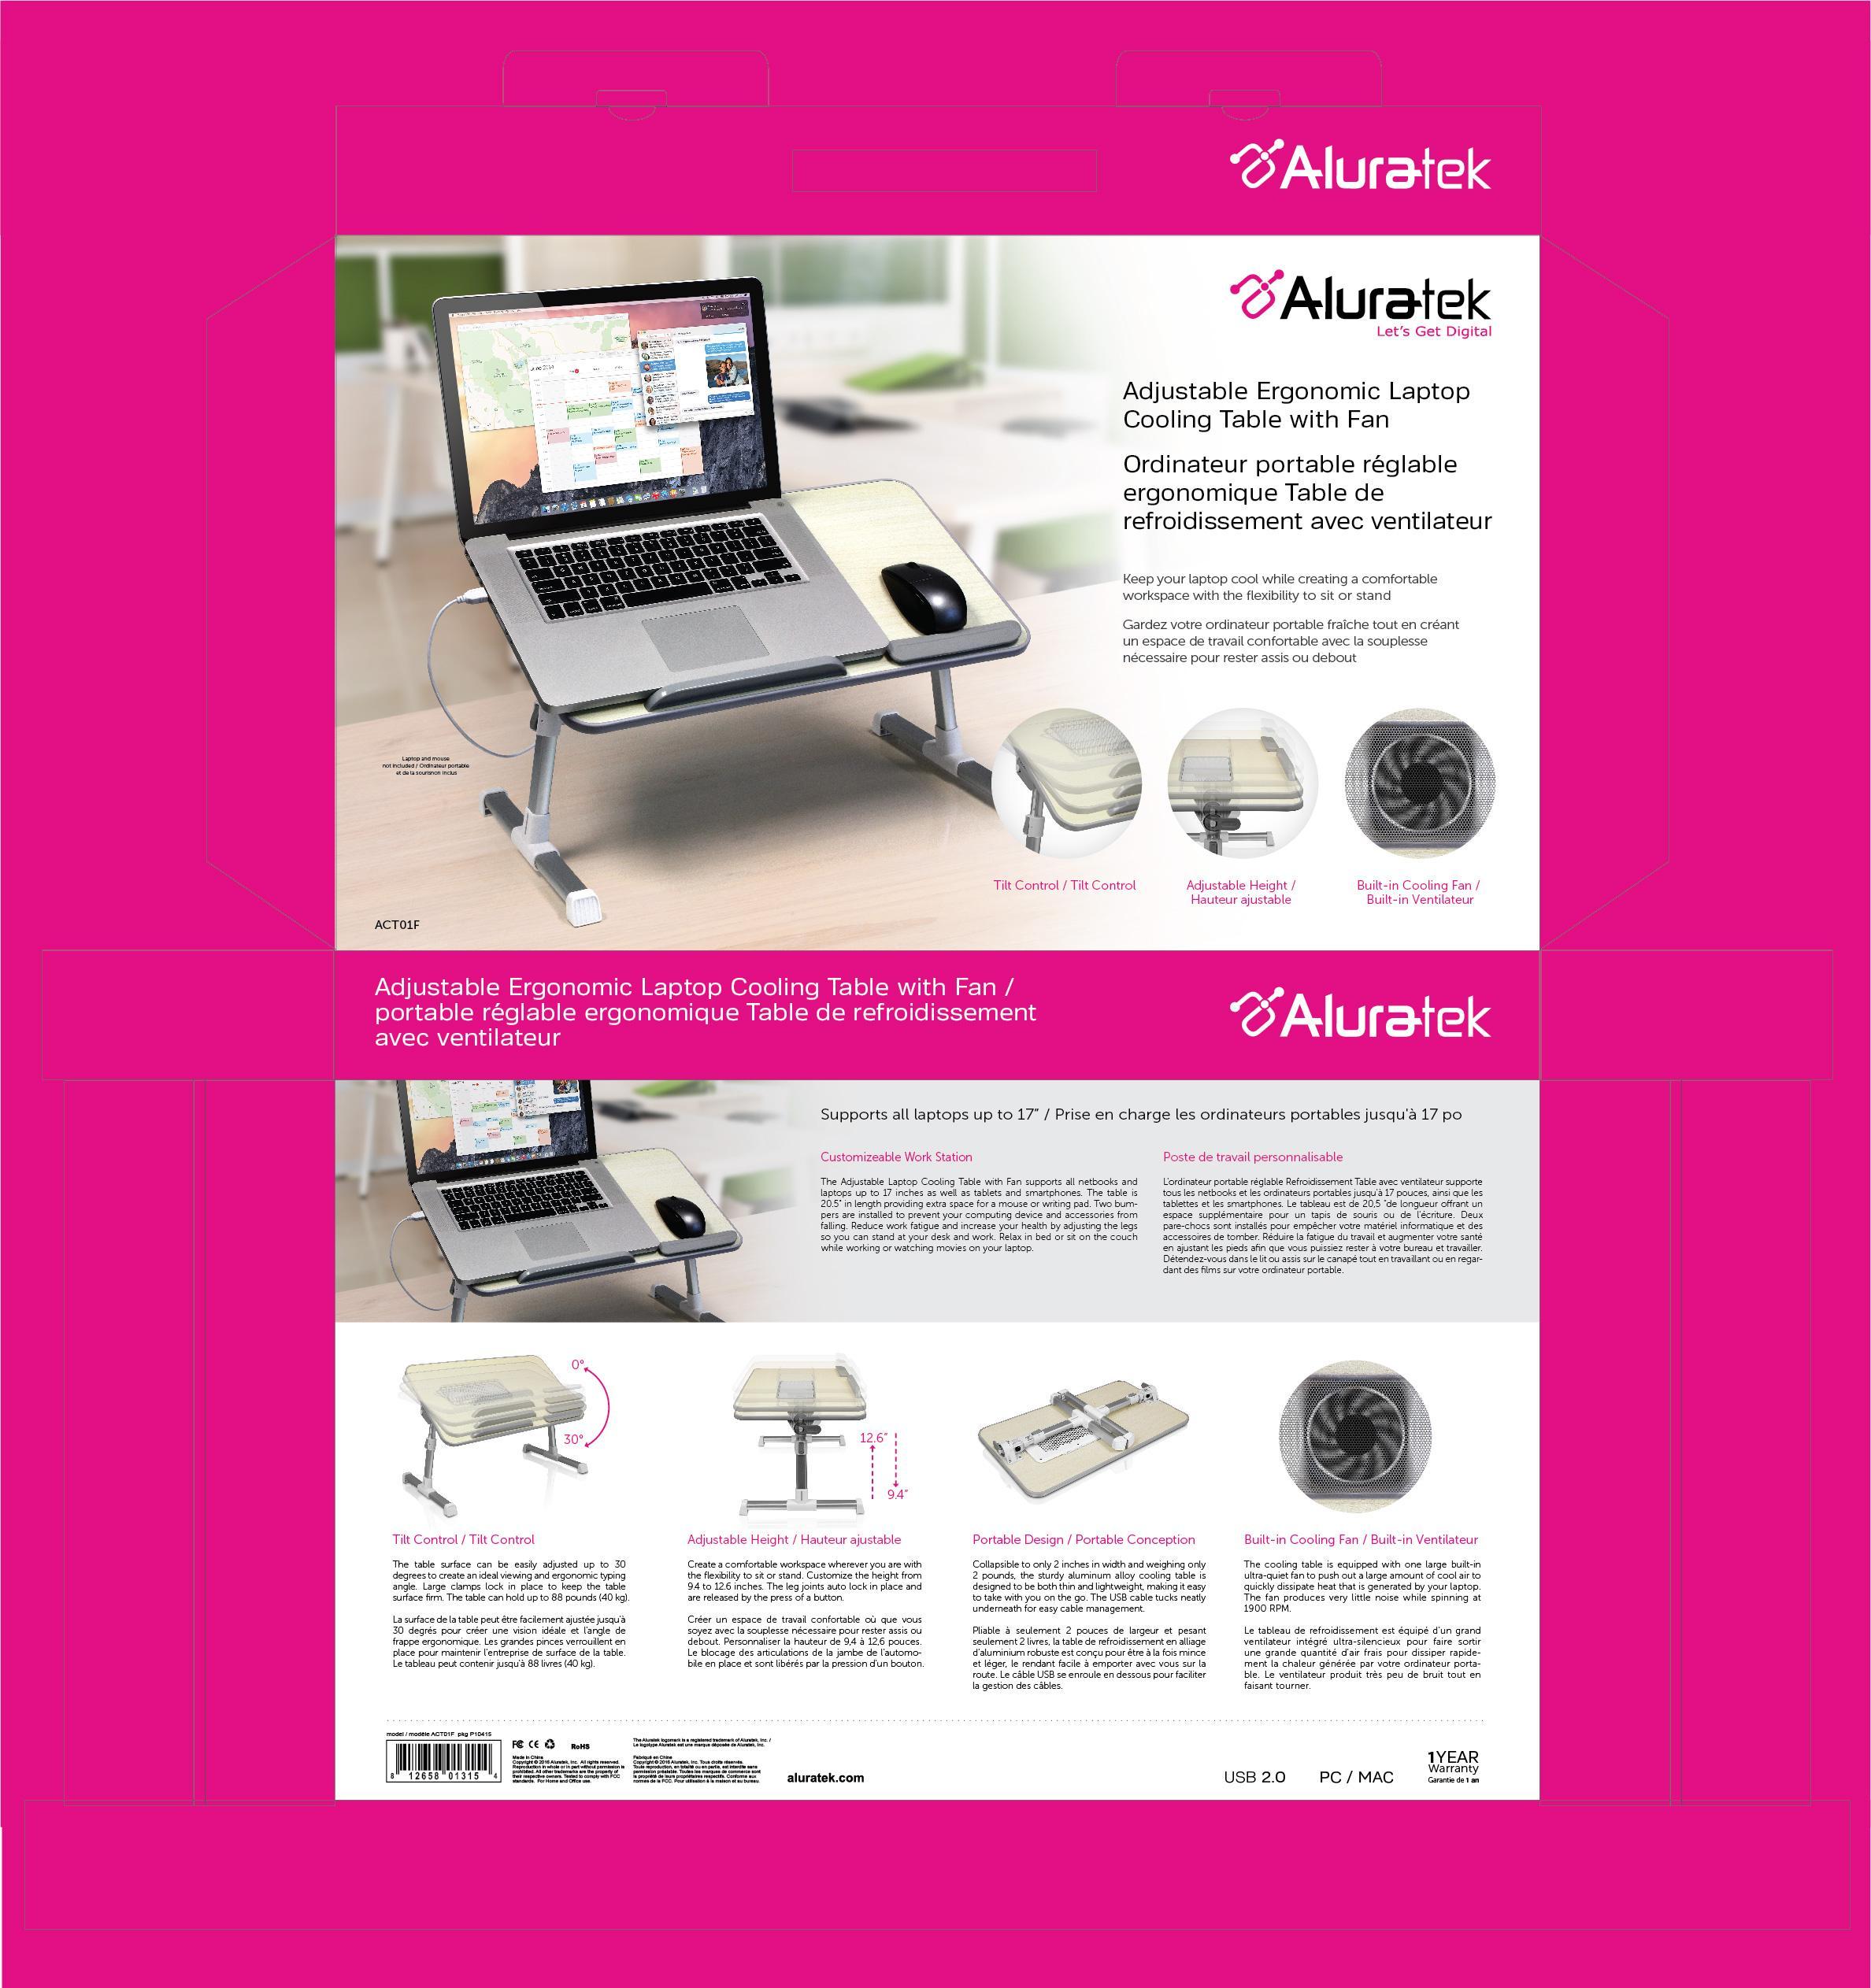 Amazon.com: Aluratek (ACT01F) Adjustable, Foldable